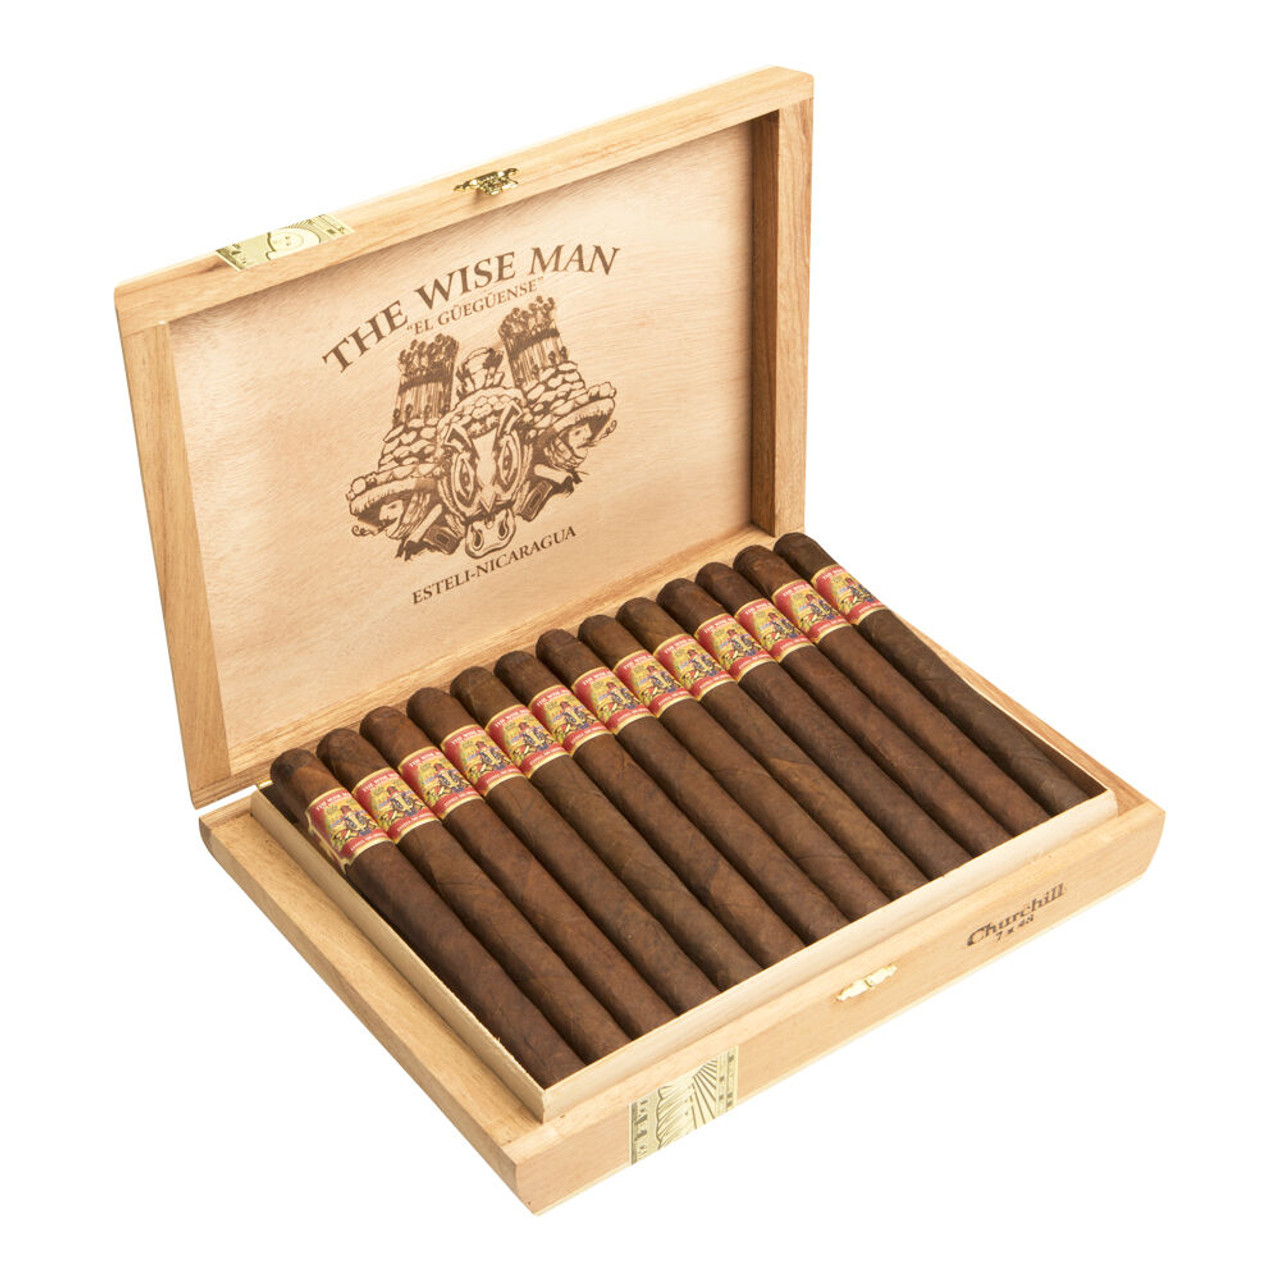 Foundation The Wise Man Maduro Robusto Cigars - 5.5 x 50 (Box of 25)